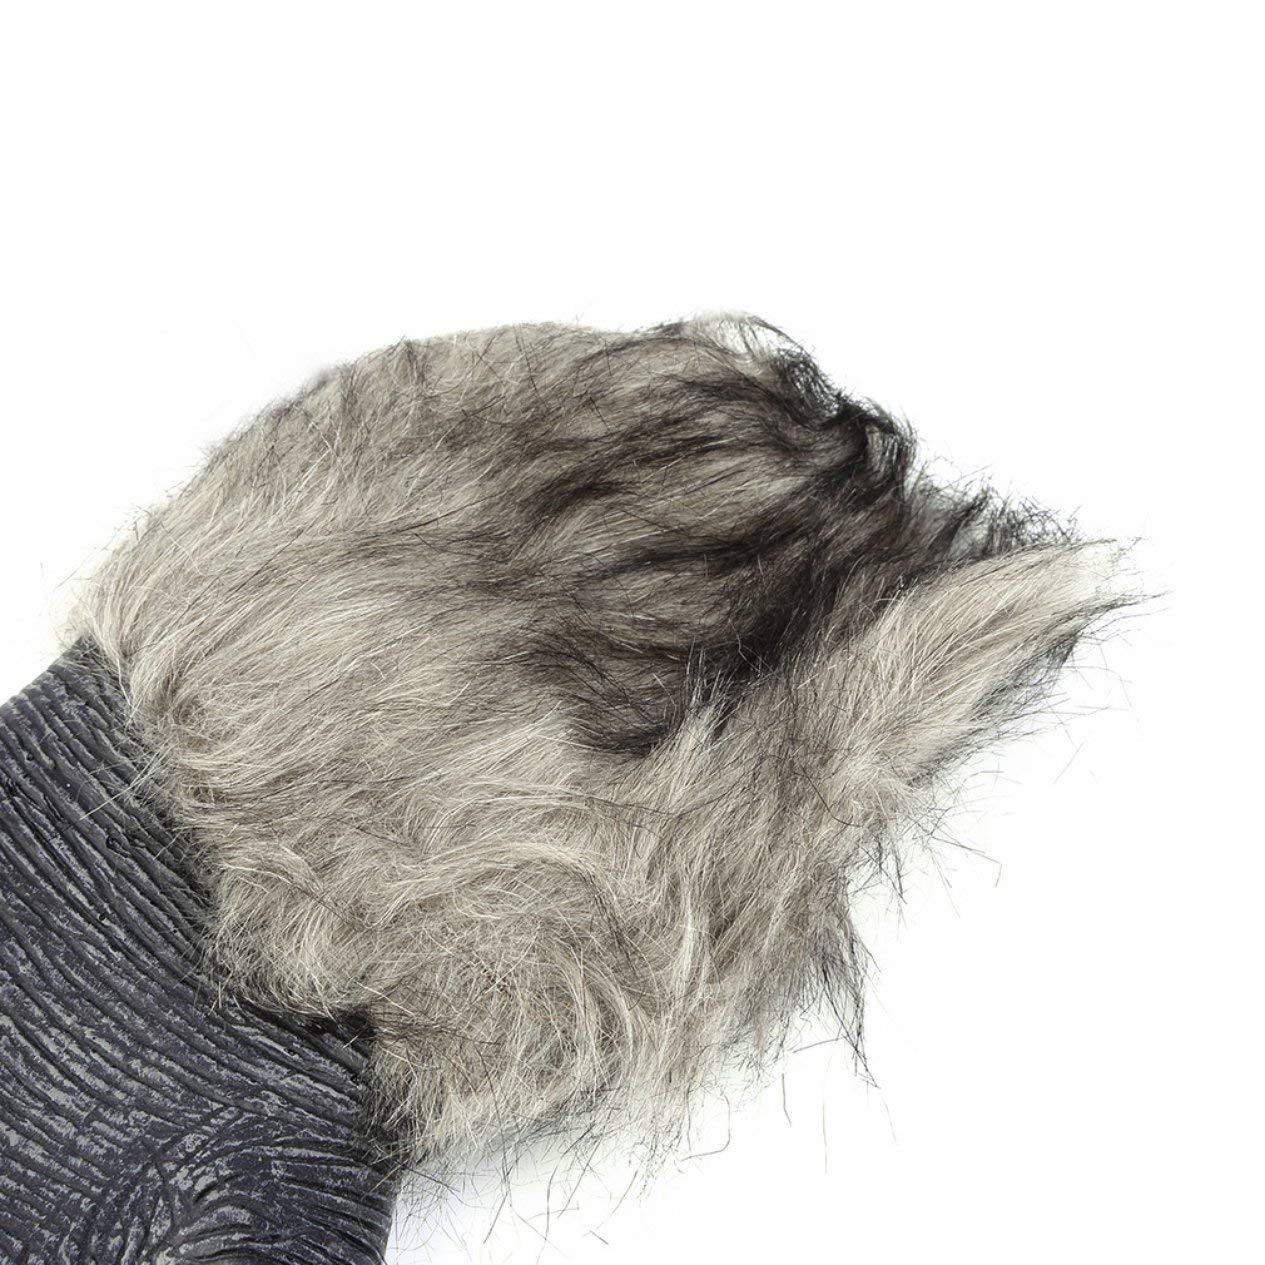 Halloween Werwolf Handschuhe Latex pelzigen Tier Handschuhe Wolf Krallen Halloween Prop Horror Teufel Party Club Lieferungen Gruselige Handschuhe Ironheel EIN Paar Wolfspfoten Handschuhe